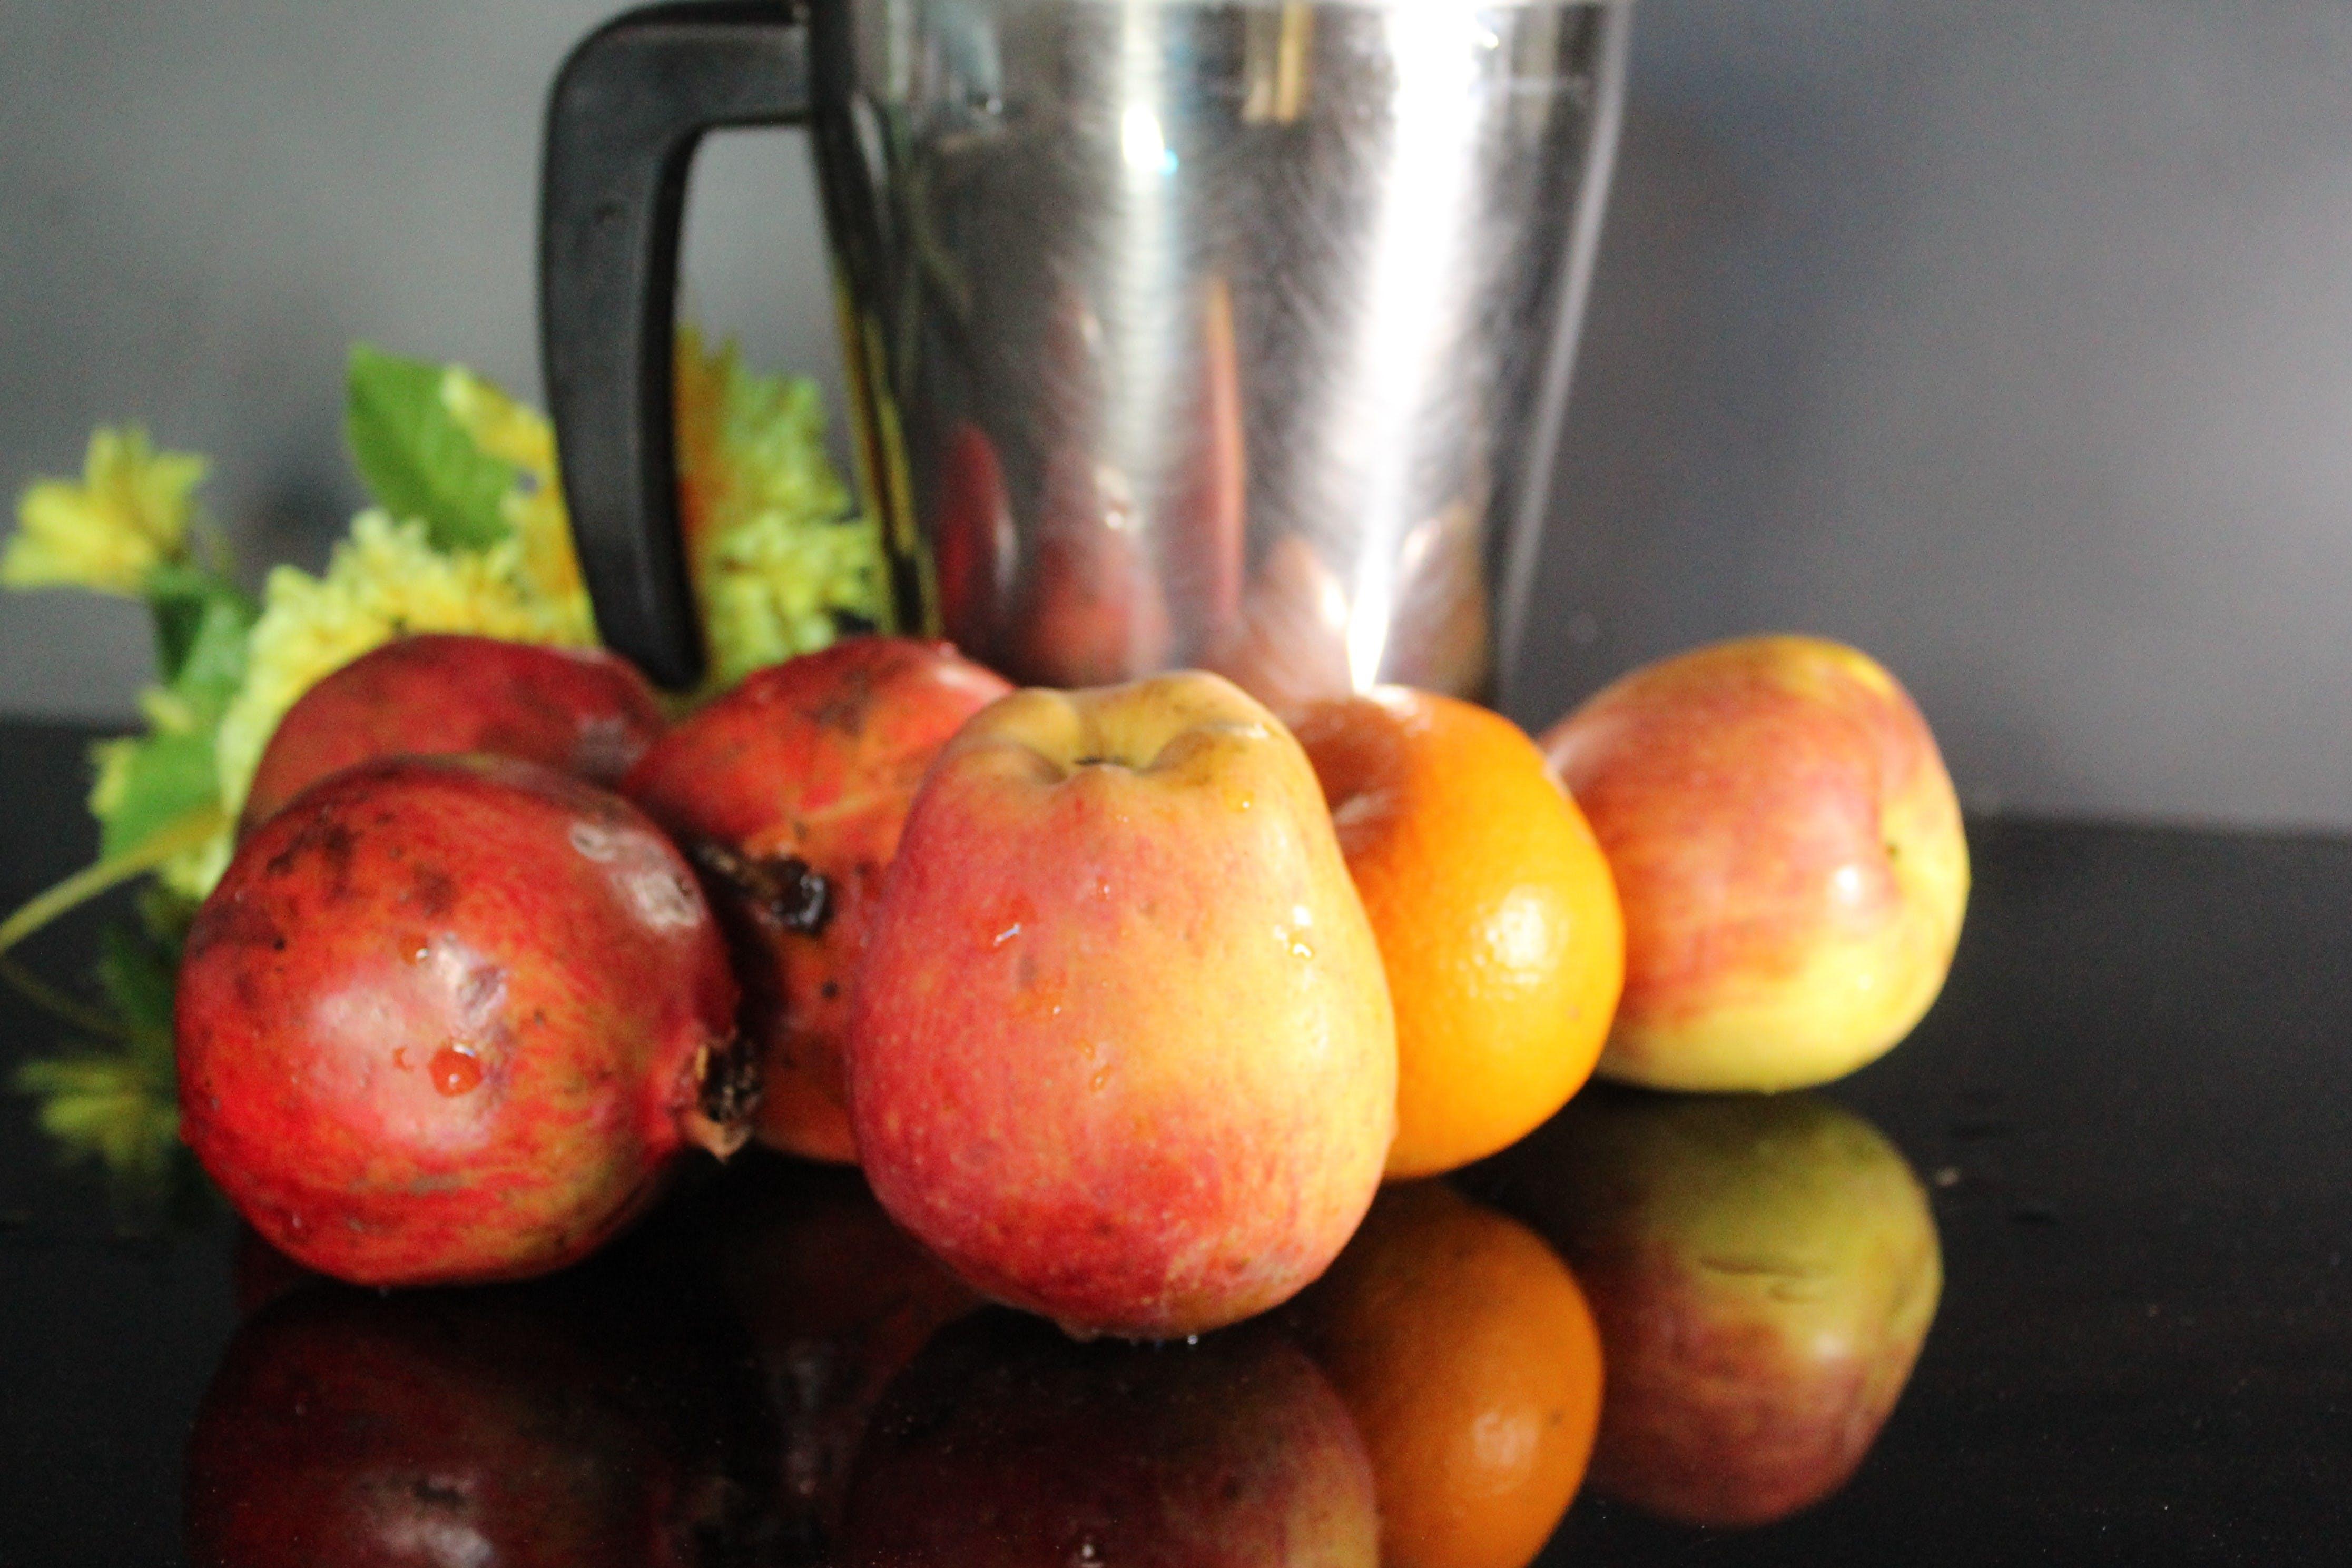 Kostenloses Stock Foto zu apfel, apfel und mixi, apfelsaft, big apple